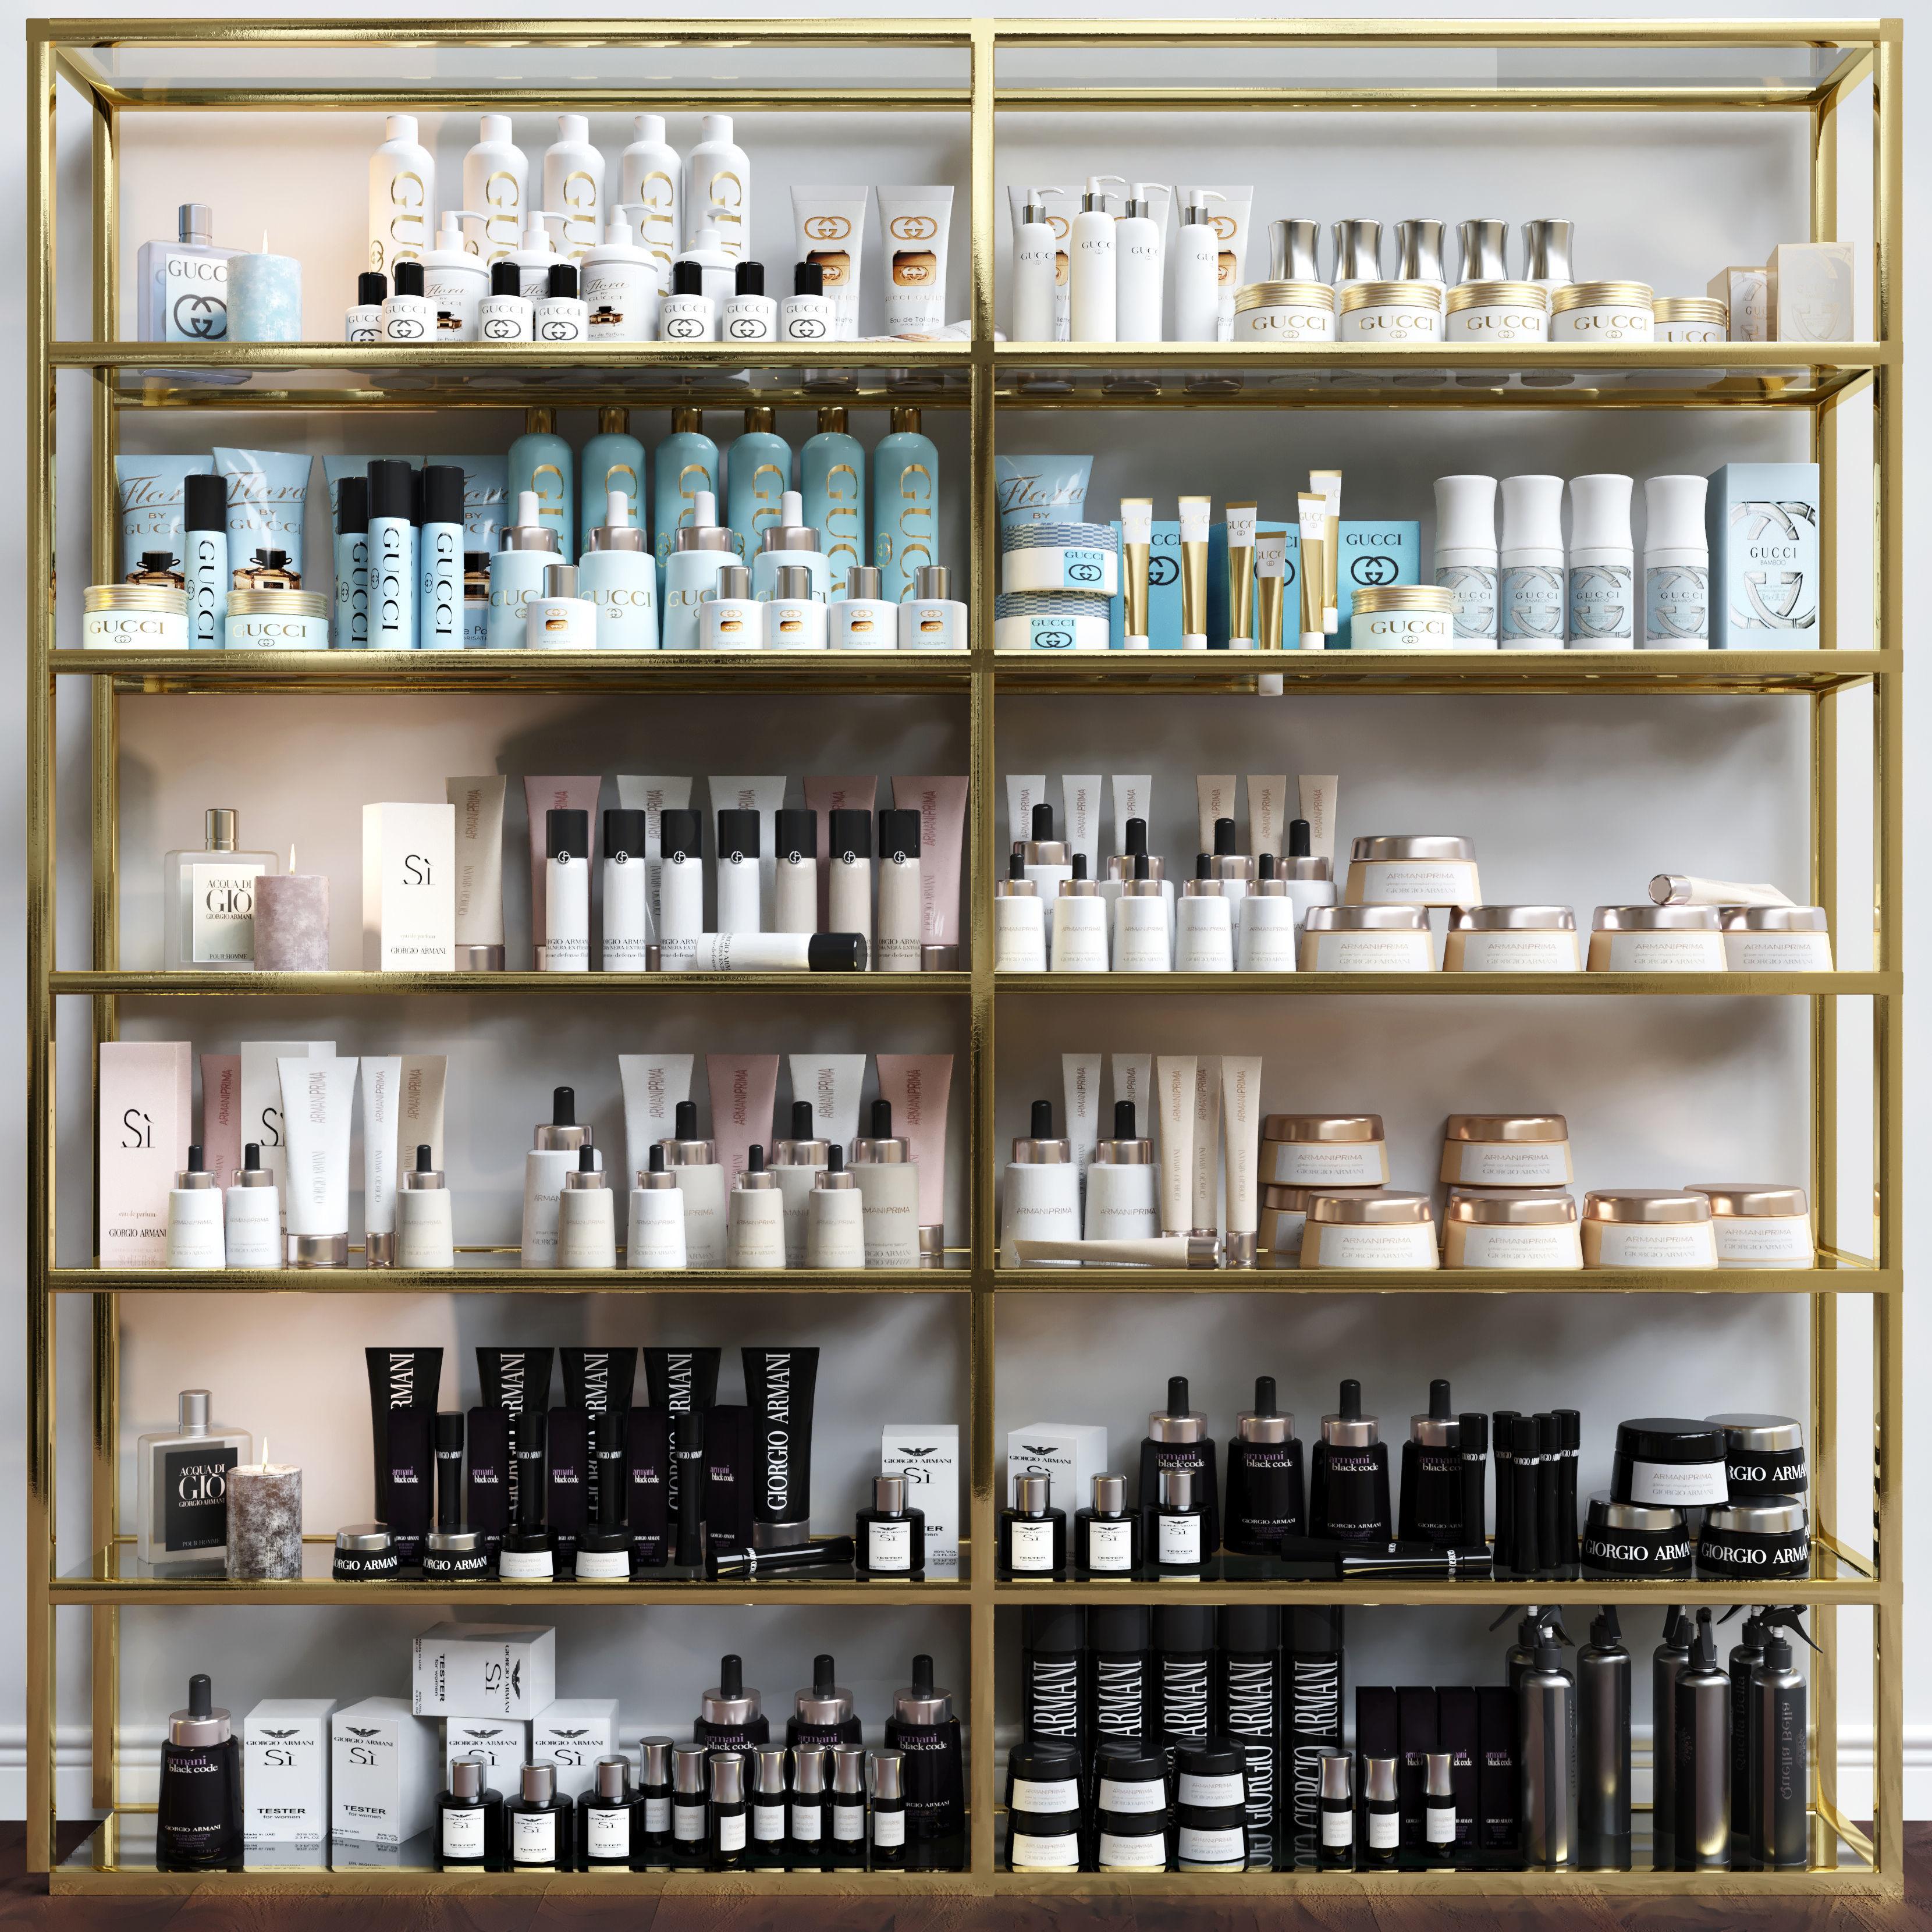 A set of premium cosmetics for a beauty salon